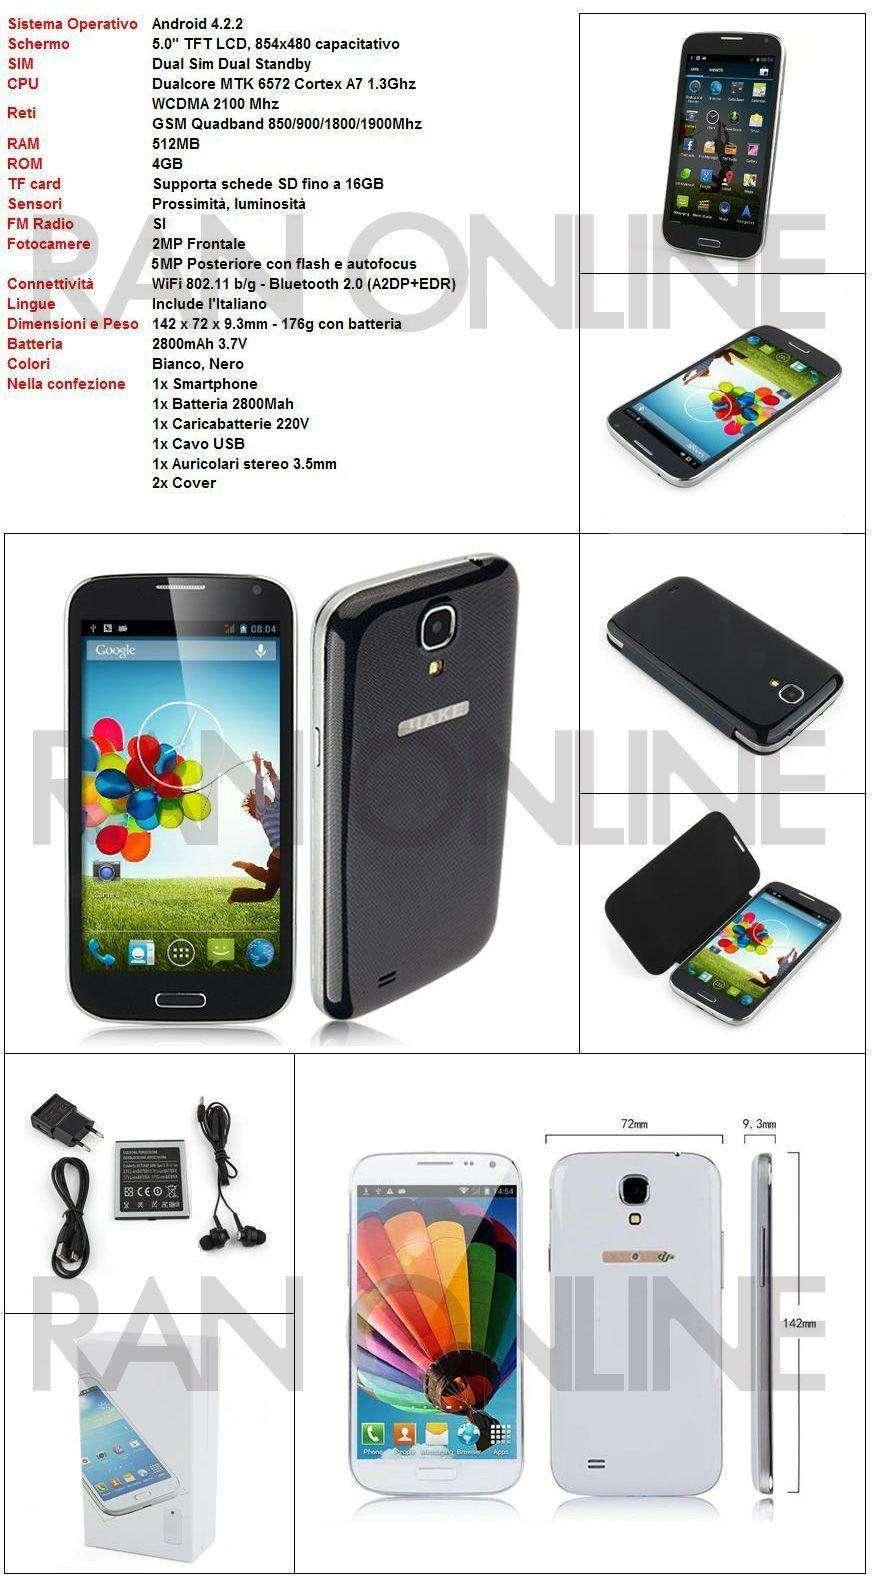 Telefono s4 smartphone 5 in wifi 3g gps dual sim android for Camera dei deputati telefono